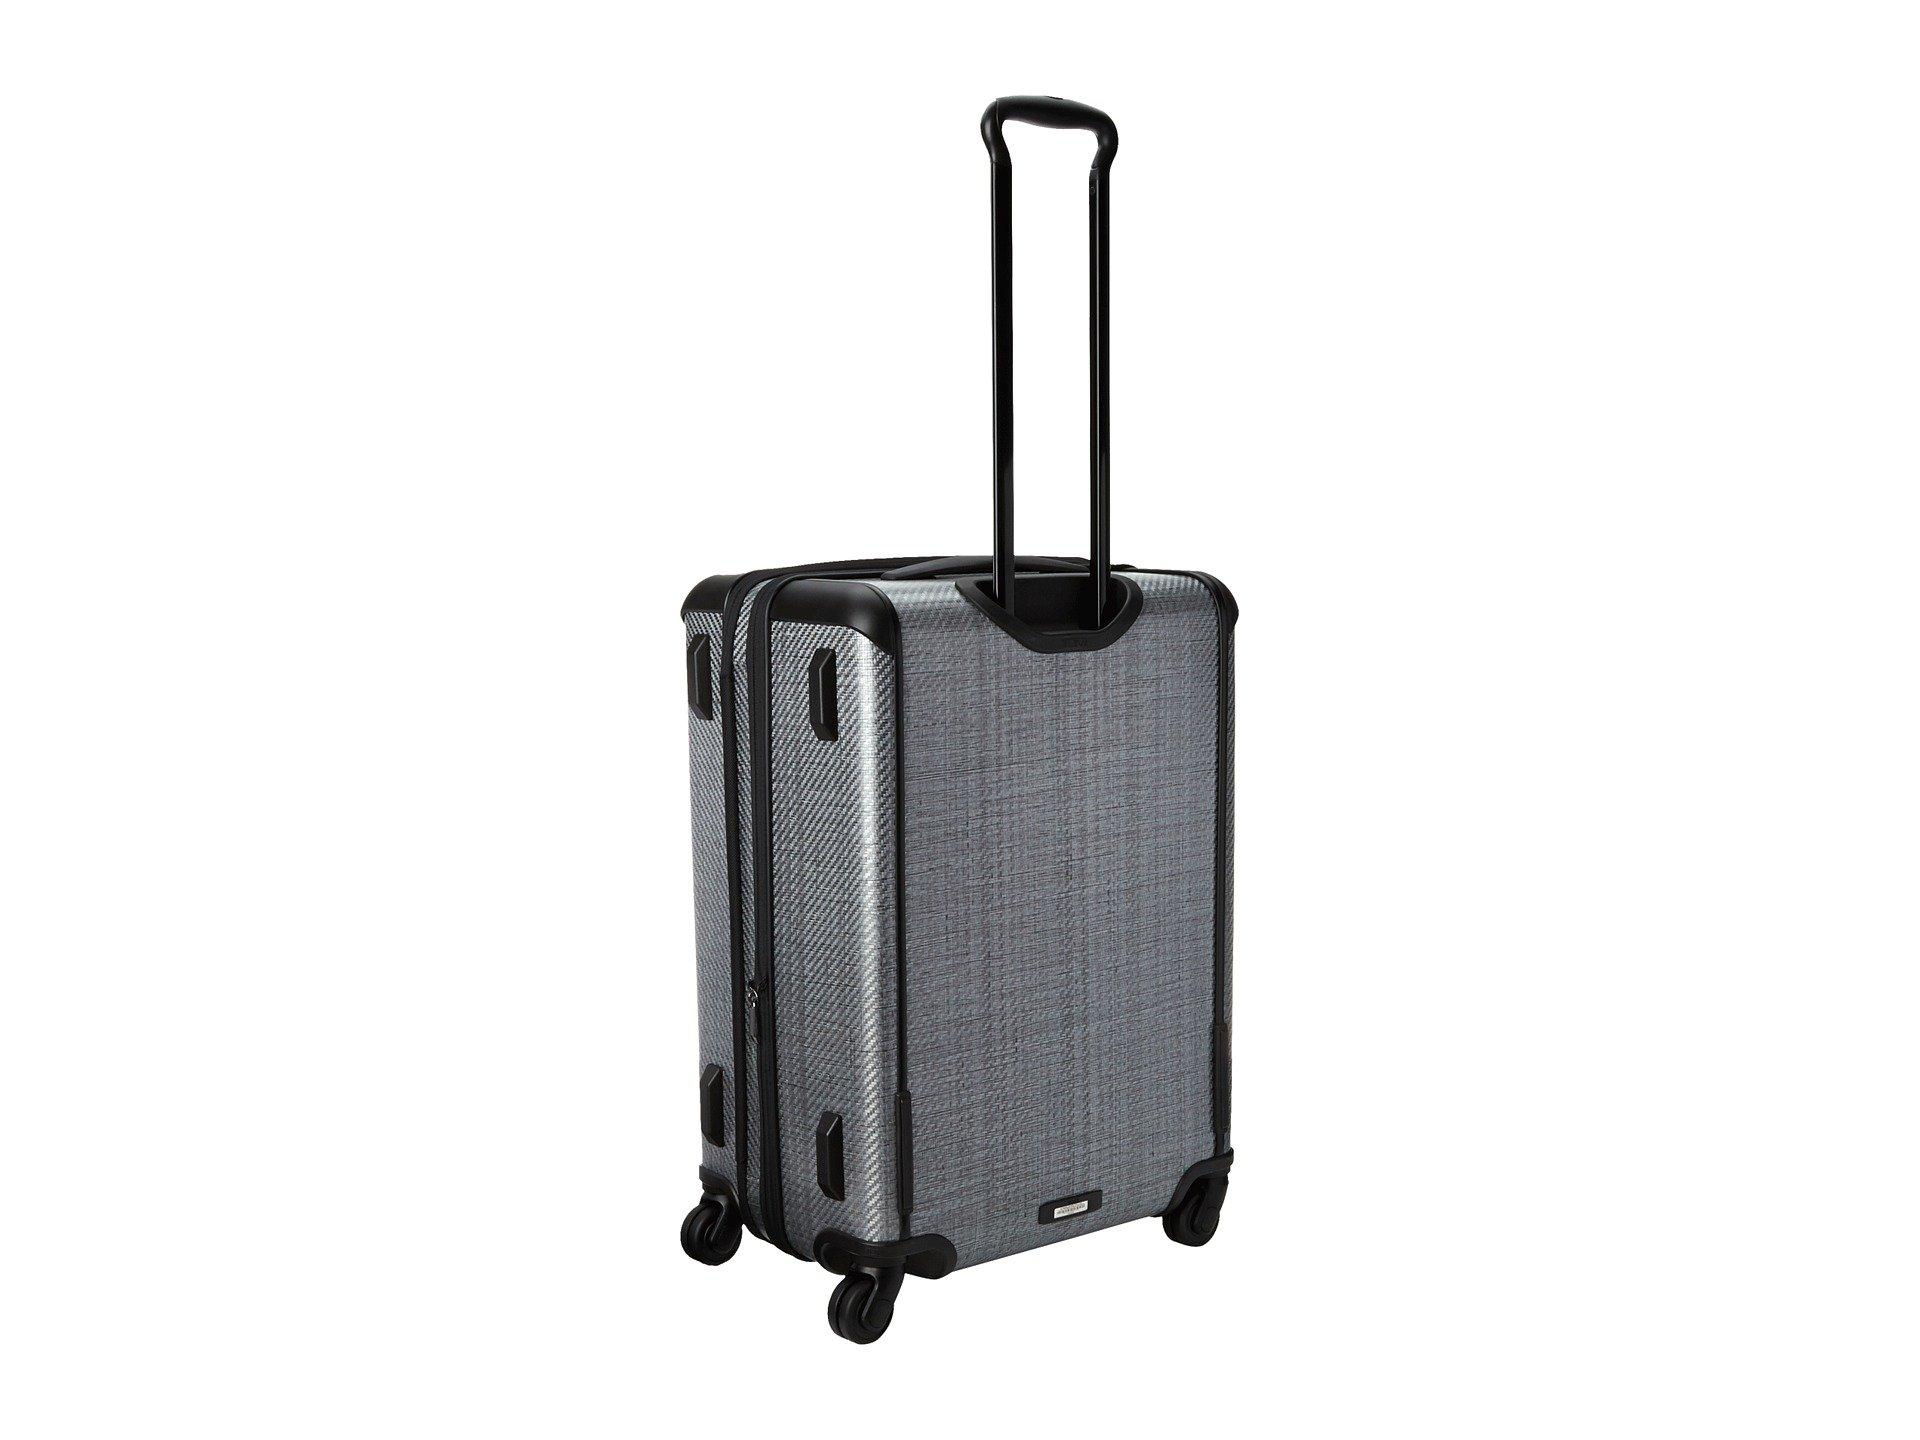 Medium Tegra Tumi Case Packing Trip T Expandable Max graphite lite® AtxdqxwRZ